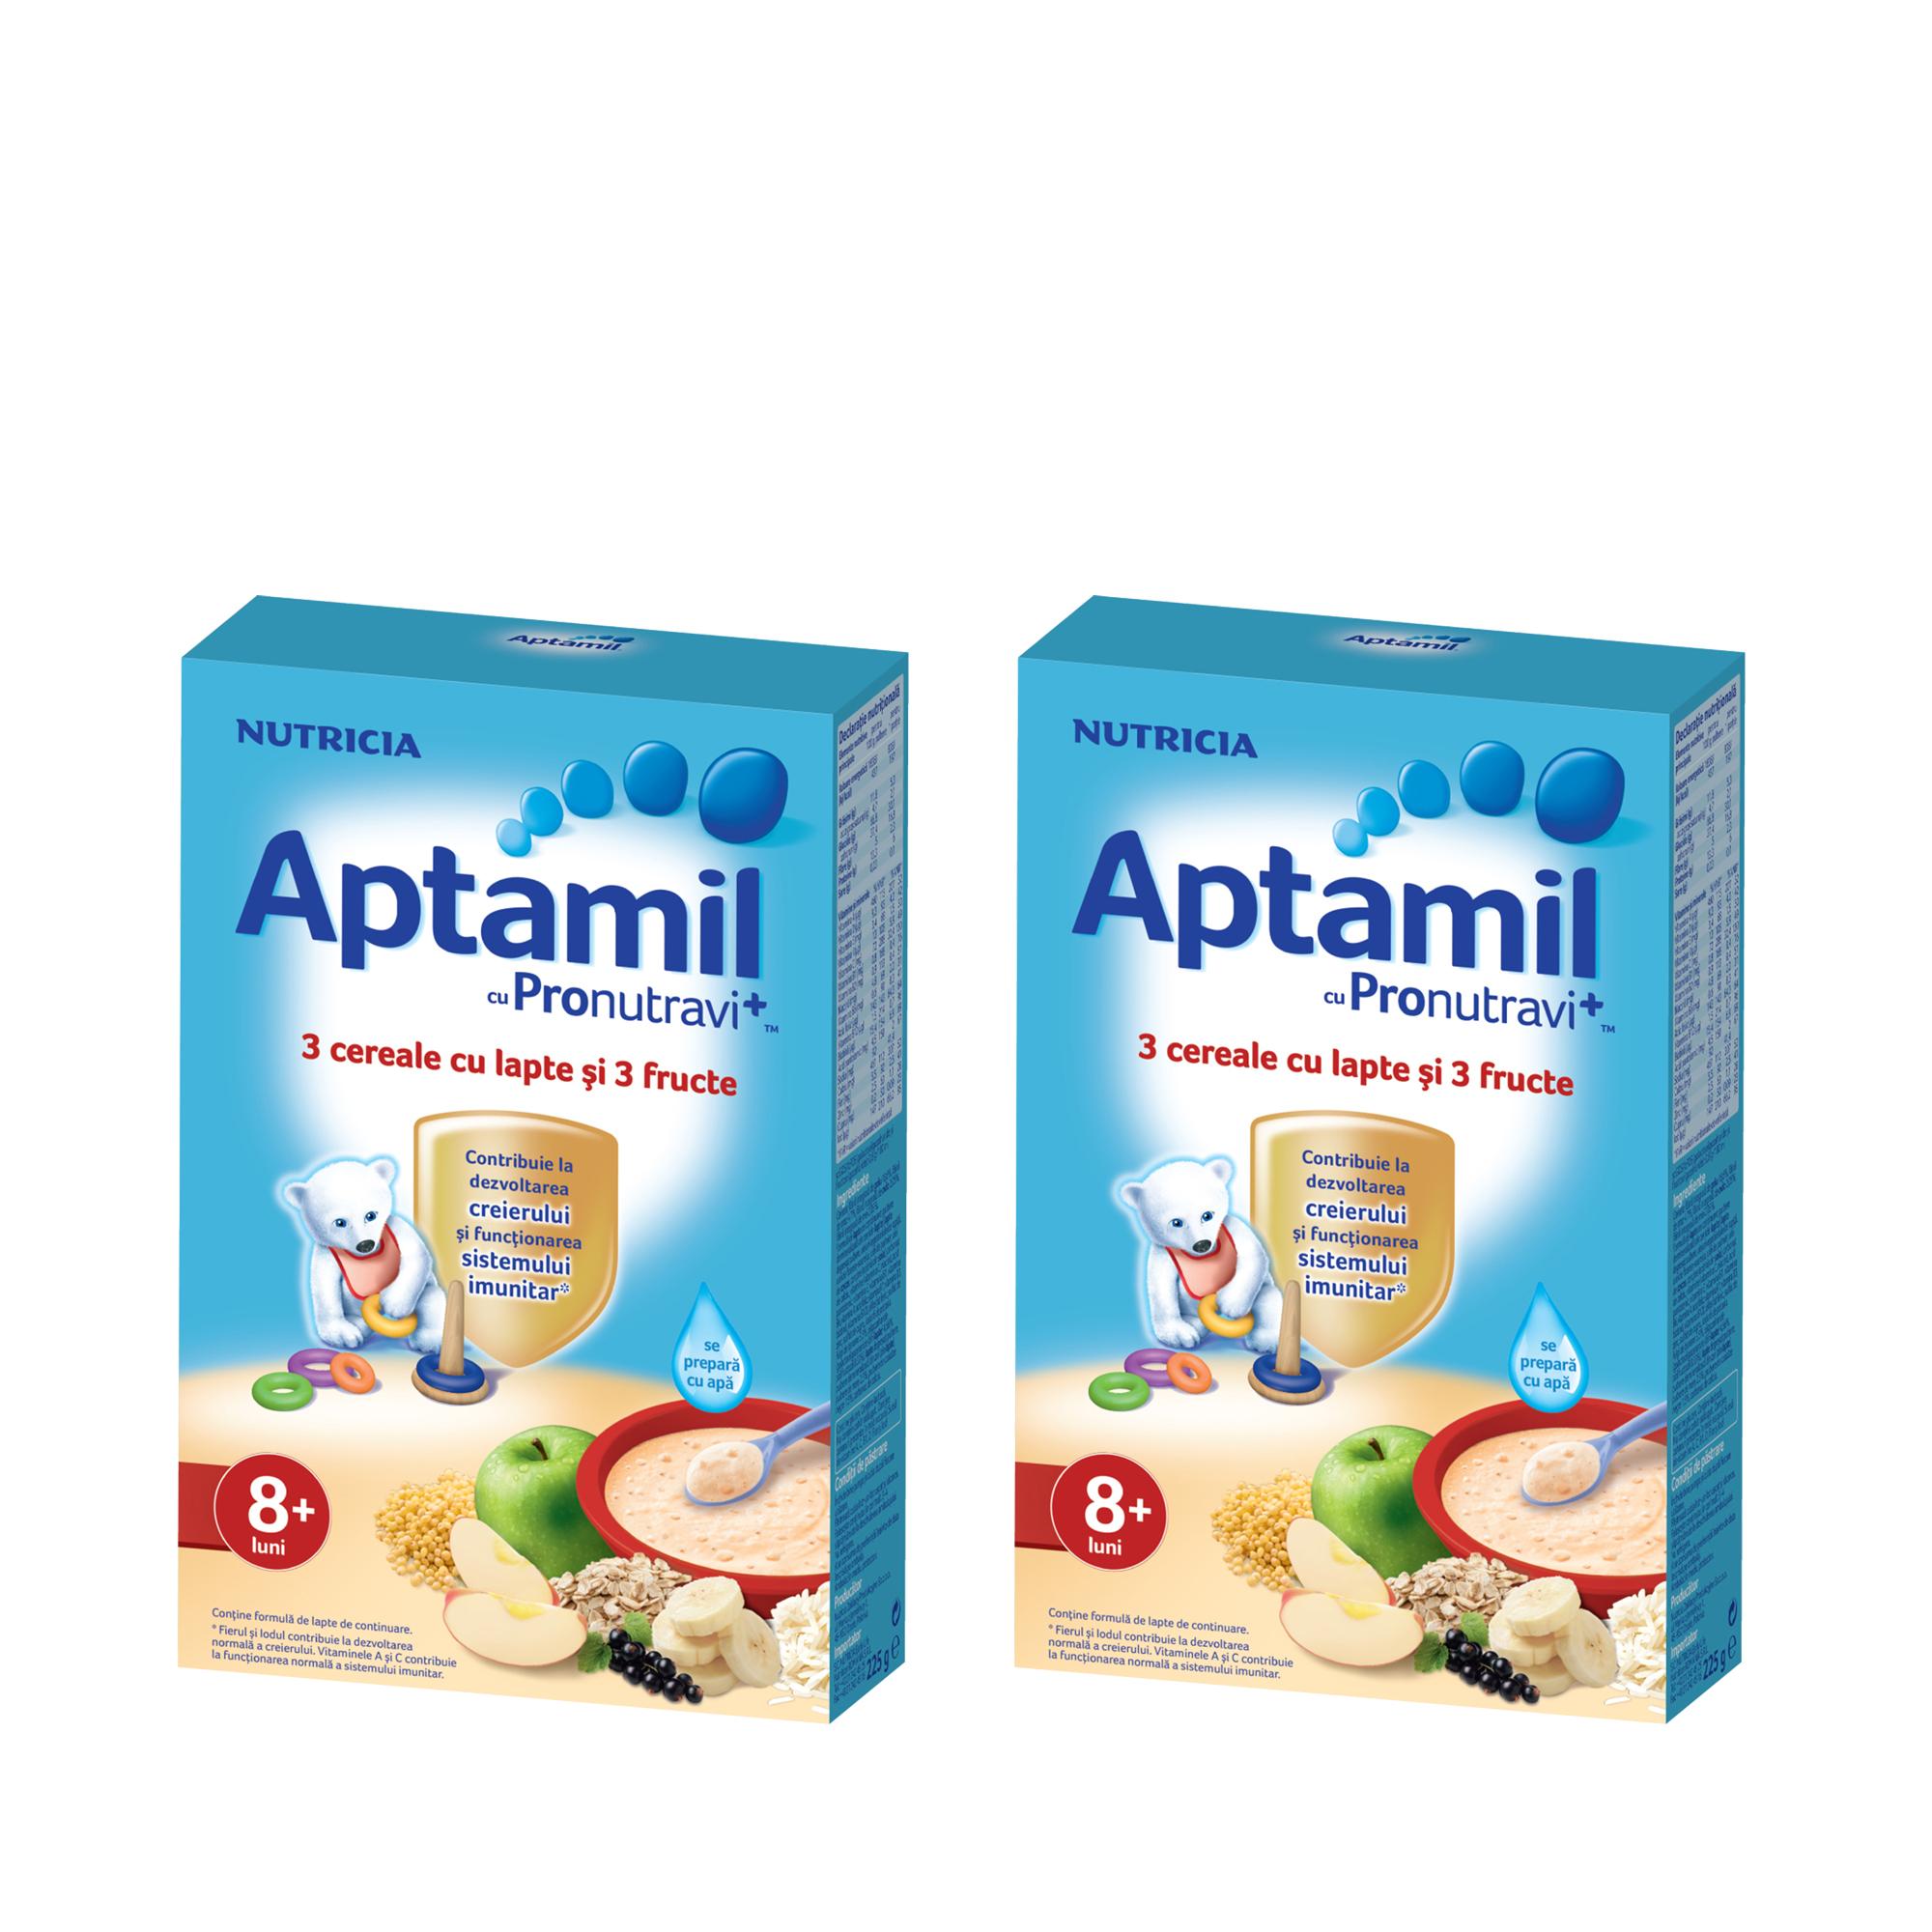 Pachet 2 x Cereale cu lapte Nutricia, Aptamil, 3 cereale si 3 fructe, 225g, 8luni+